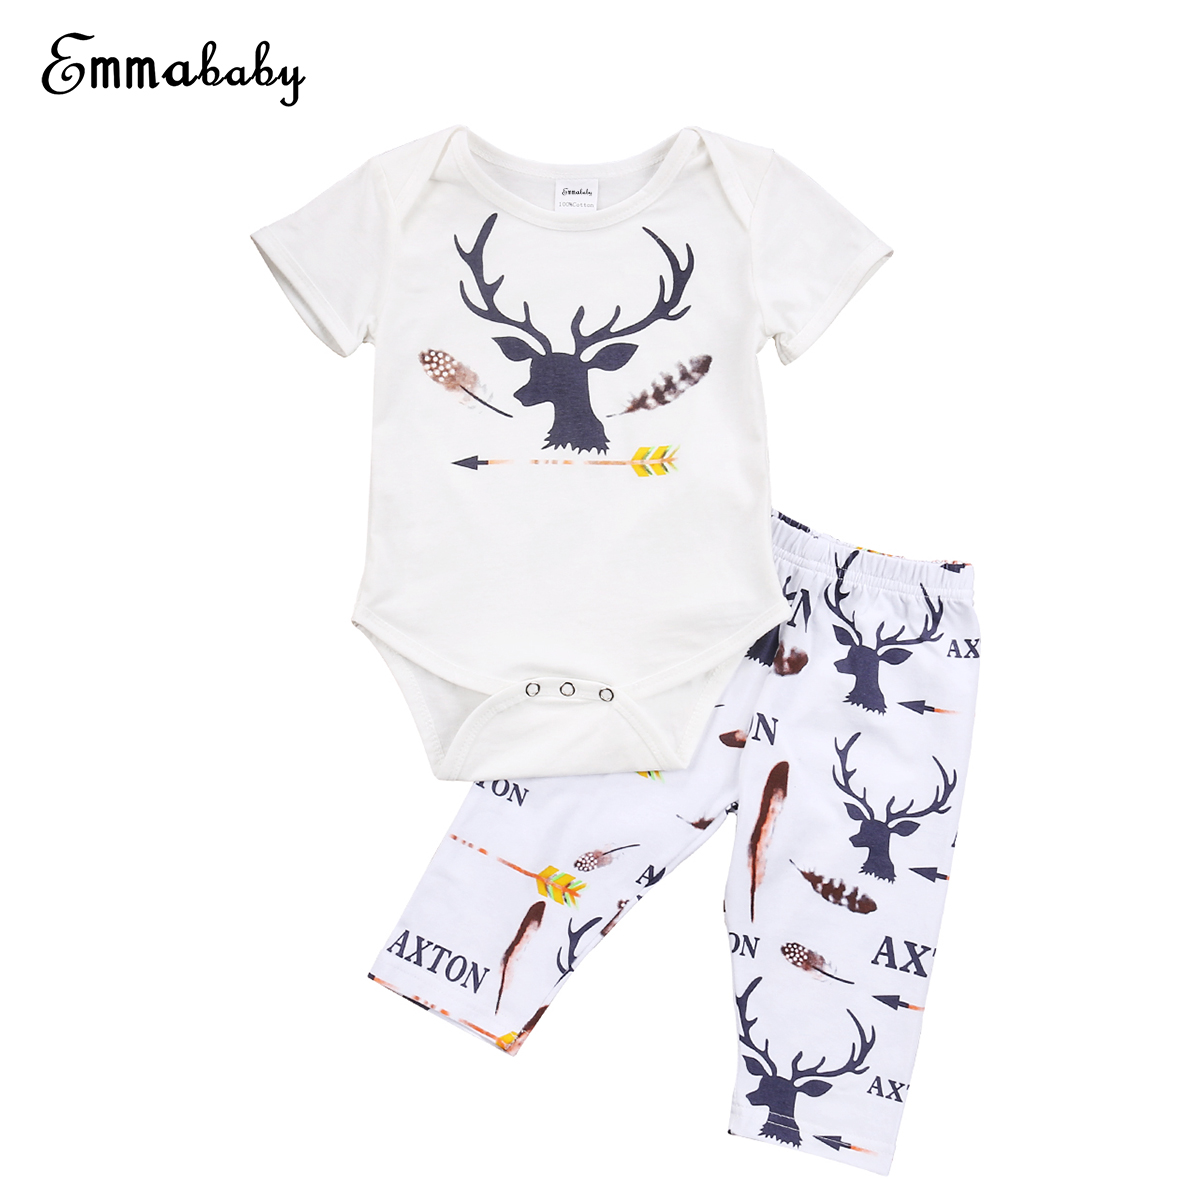 US Stock Newborn Baby Boy Girl Christmas Bodysuit Romper Pants 2Pcs Outfits Set